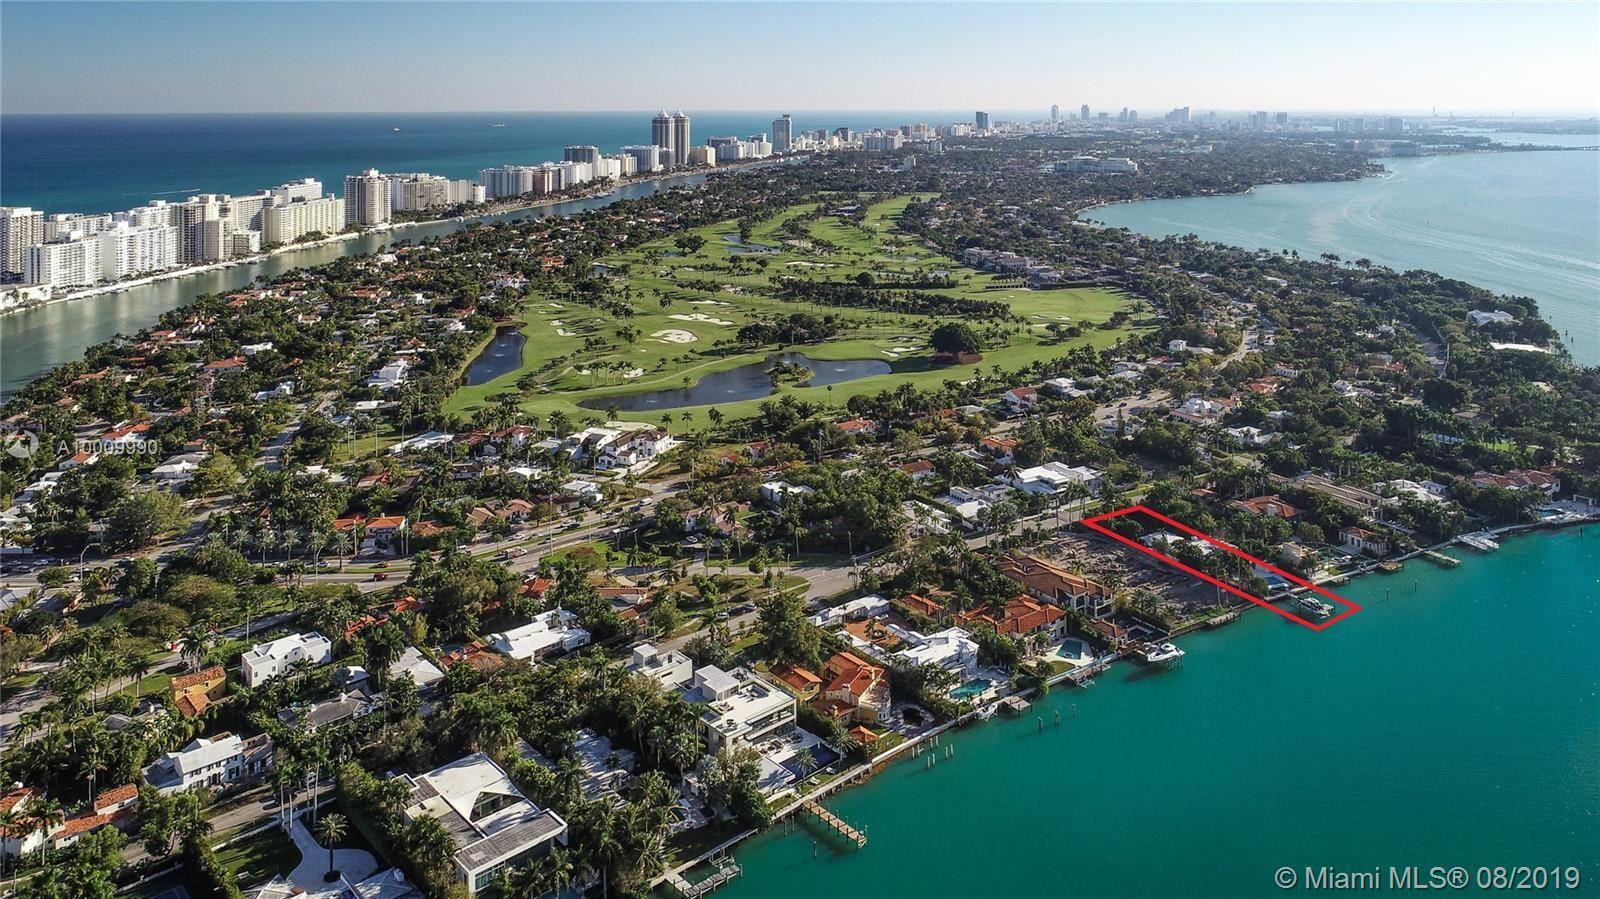 Photo 6 of Listing MLS a10009990 in 6050 N Bay Rd Miami Beach FL 33140